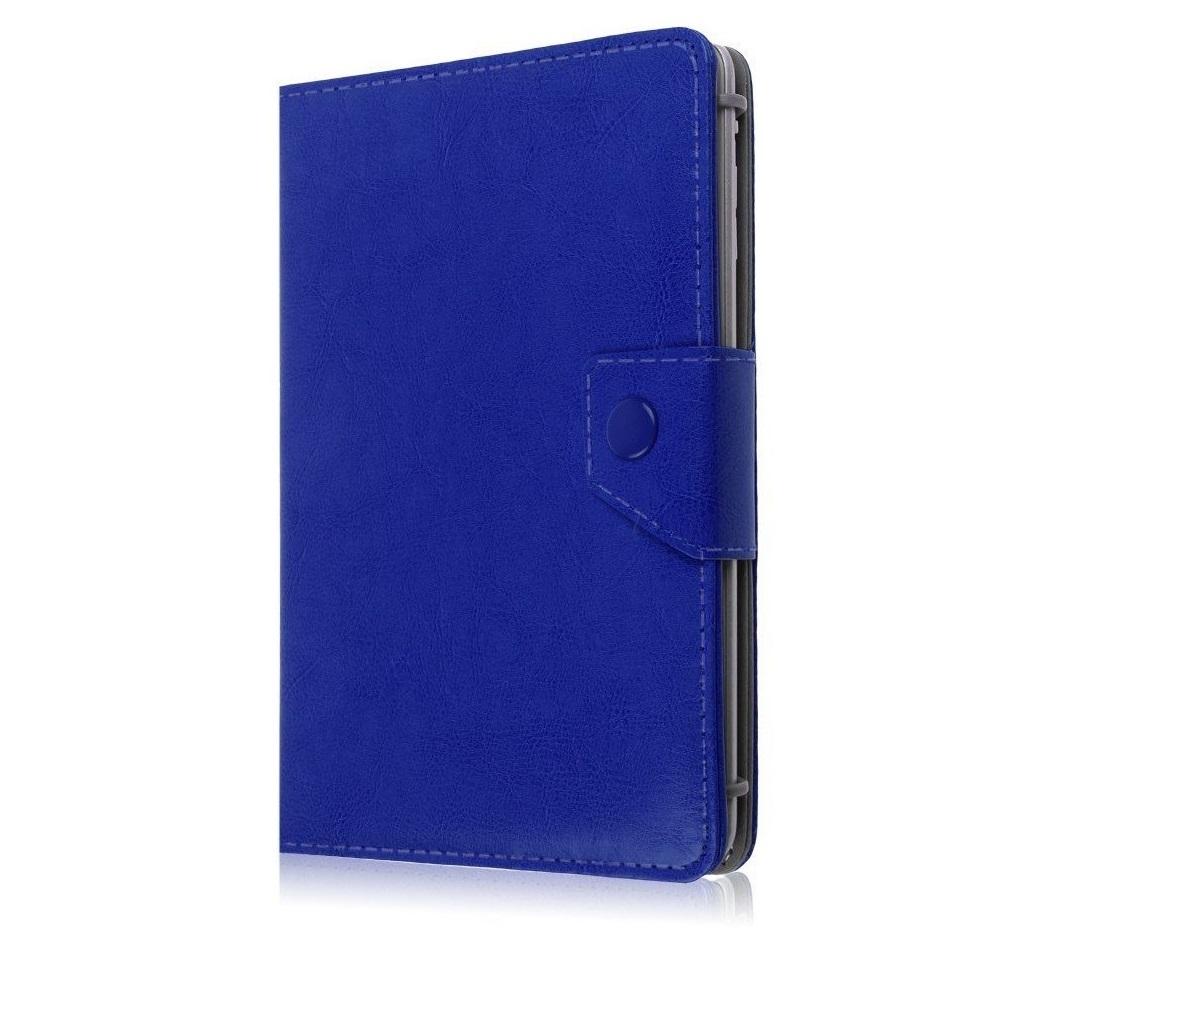 Husa tableta model X MRG L-346, 8 inch, Albastru